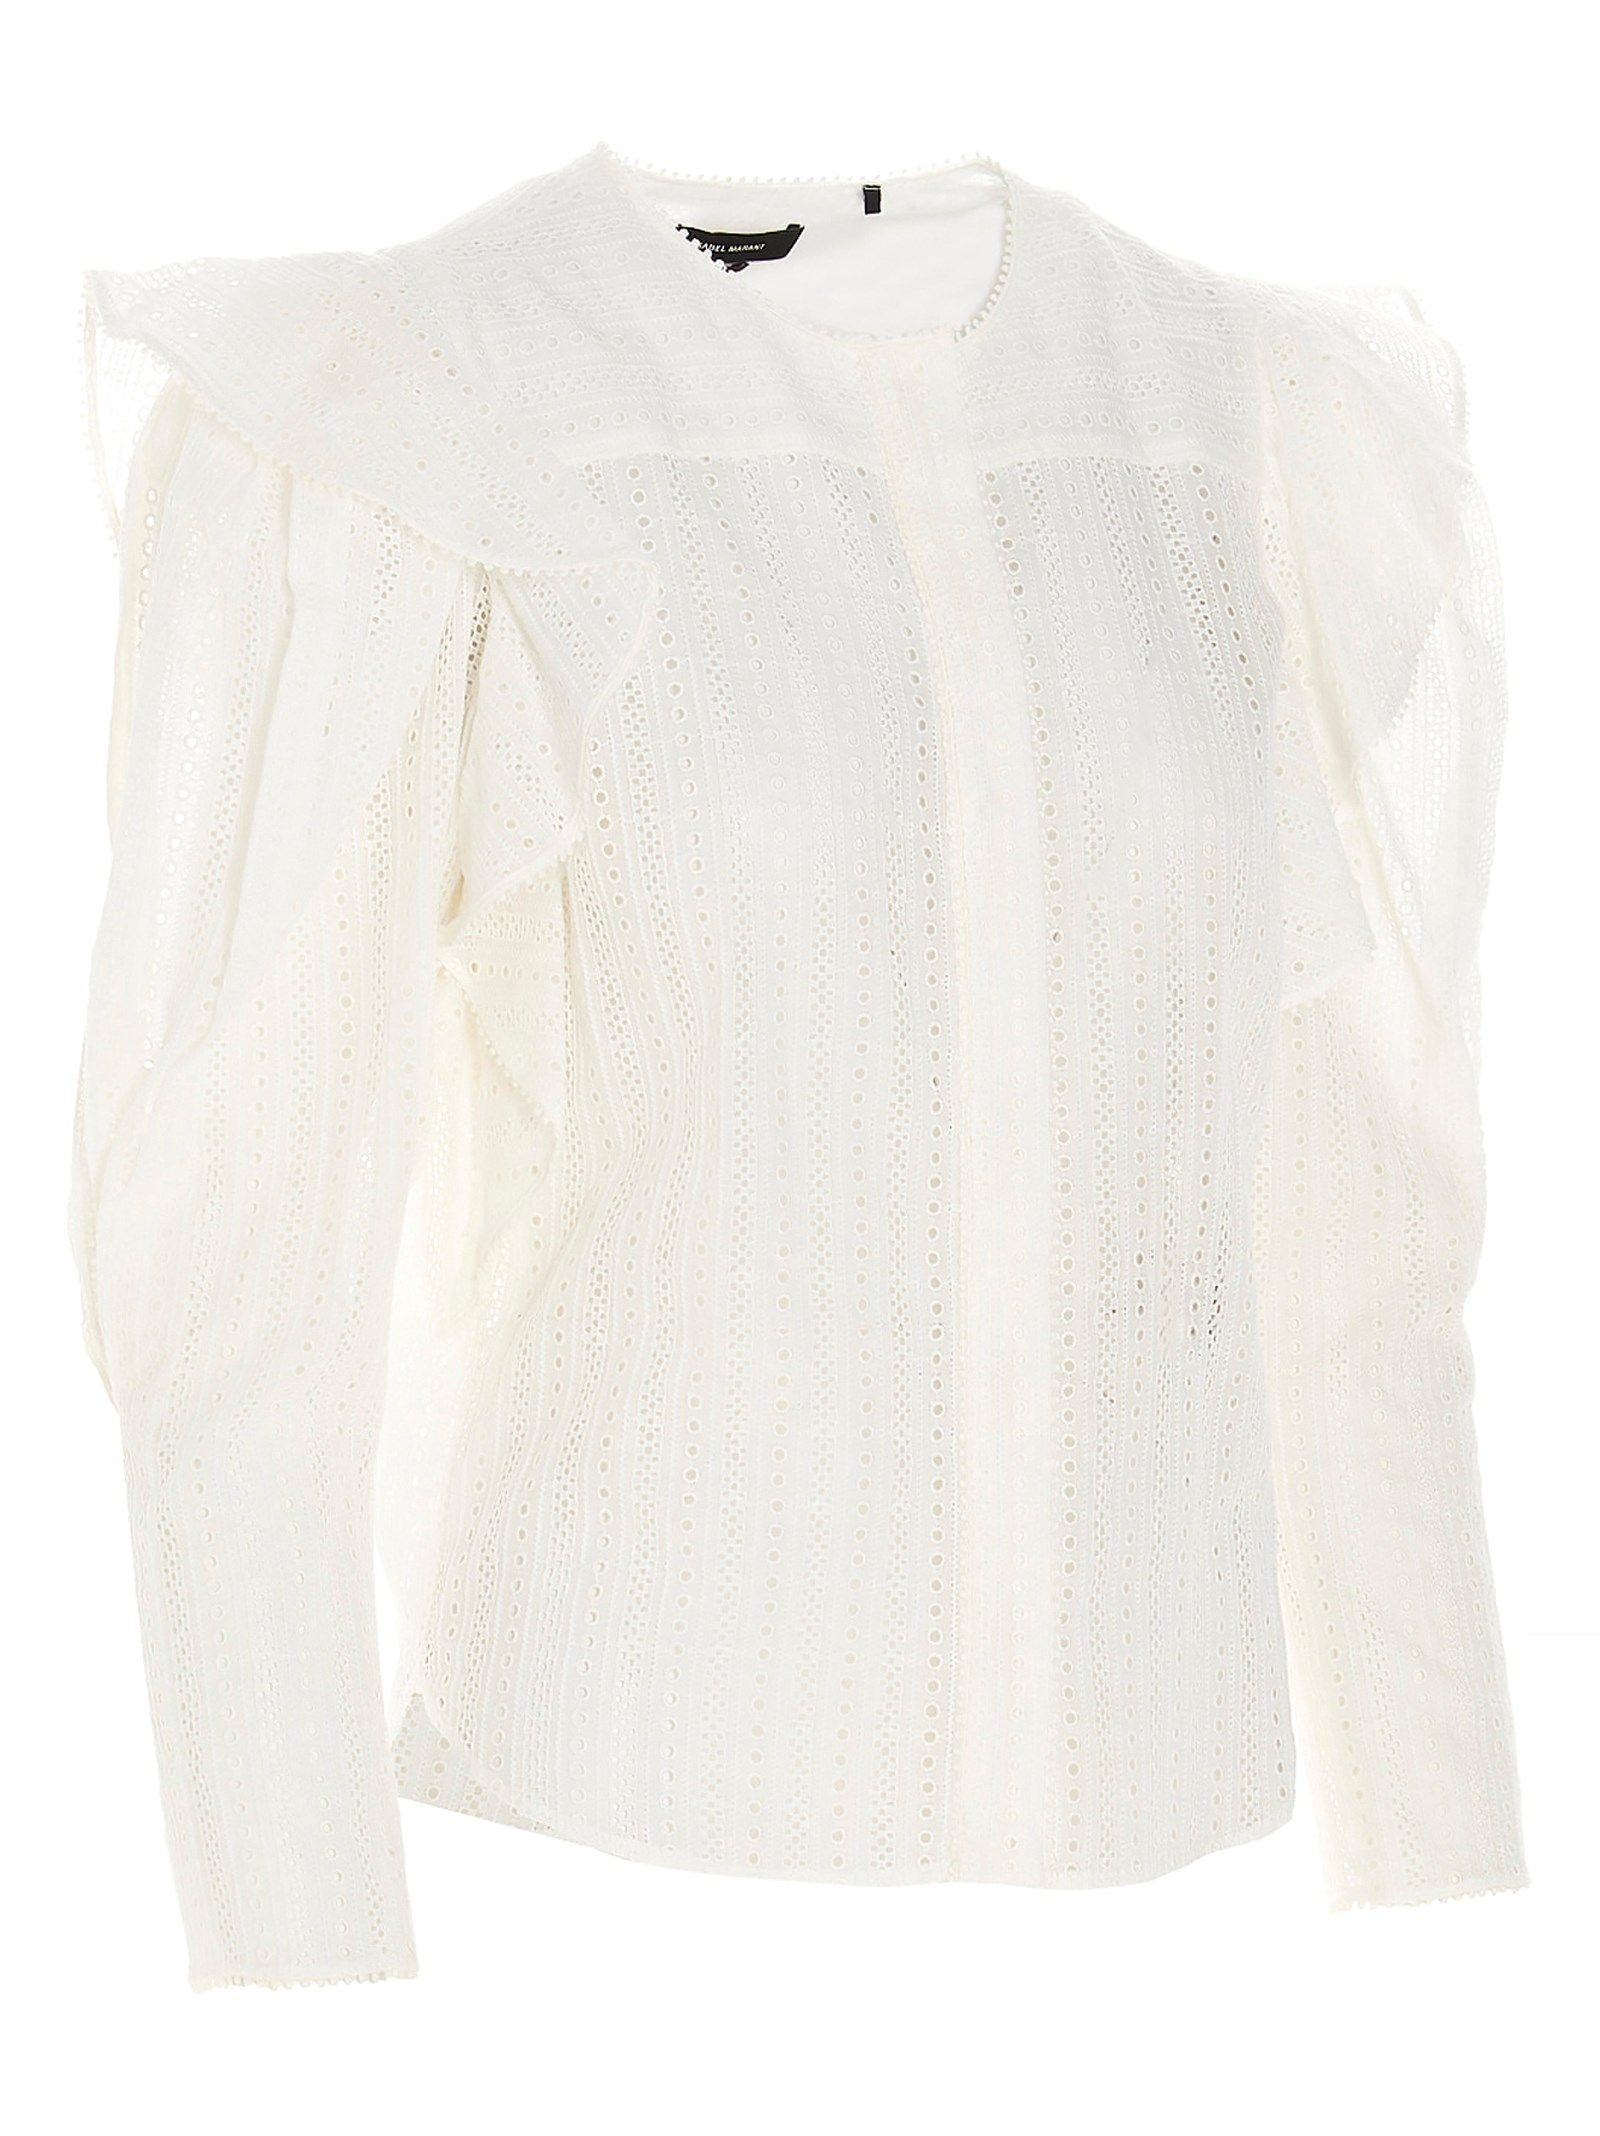 ISABEL MARANT Shirts ISABEL MARANT WOMEN'S WHITE OTHER MATERIALS SHIRT